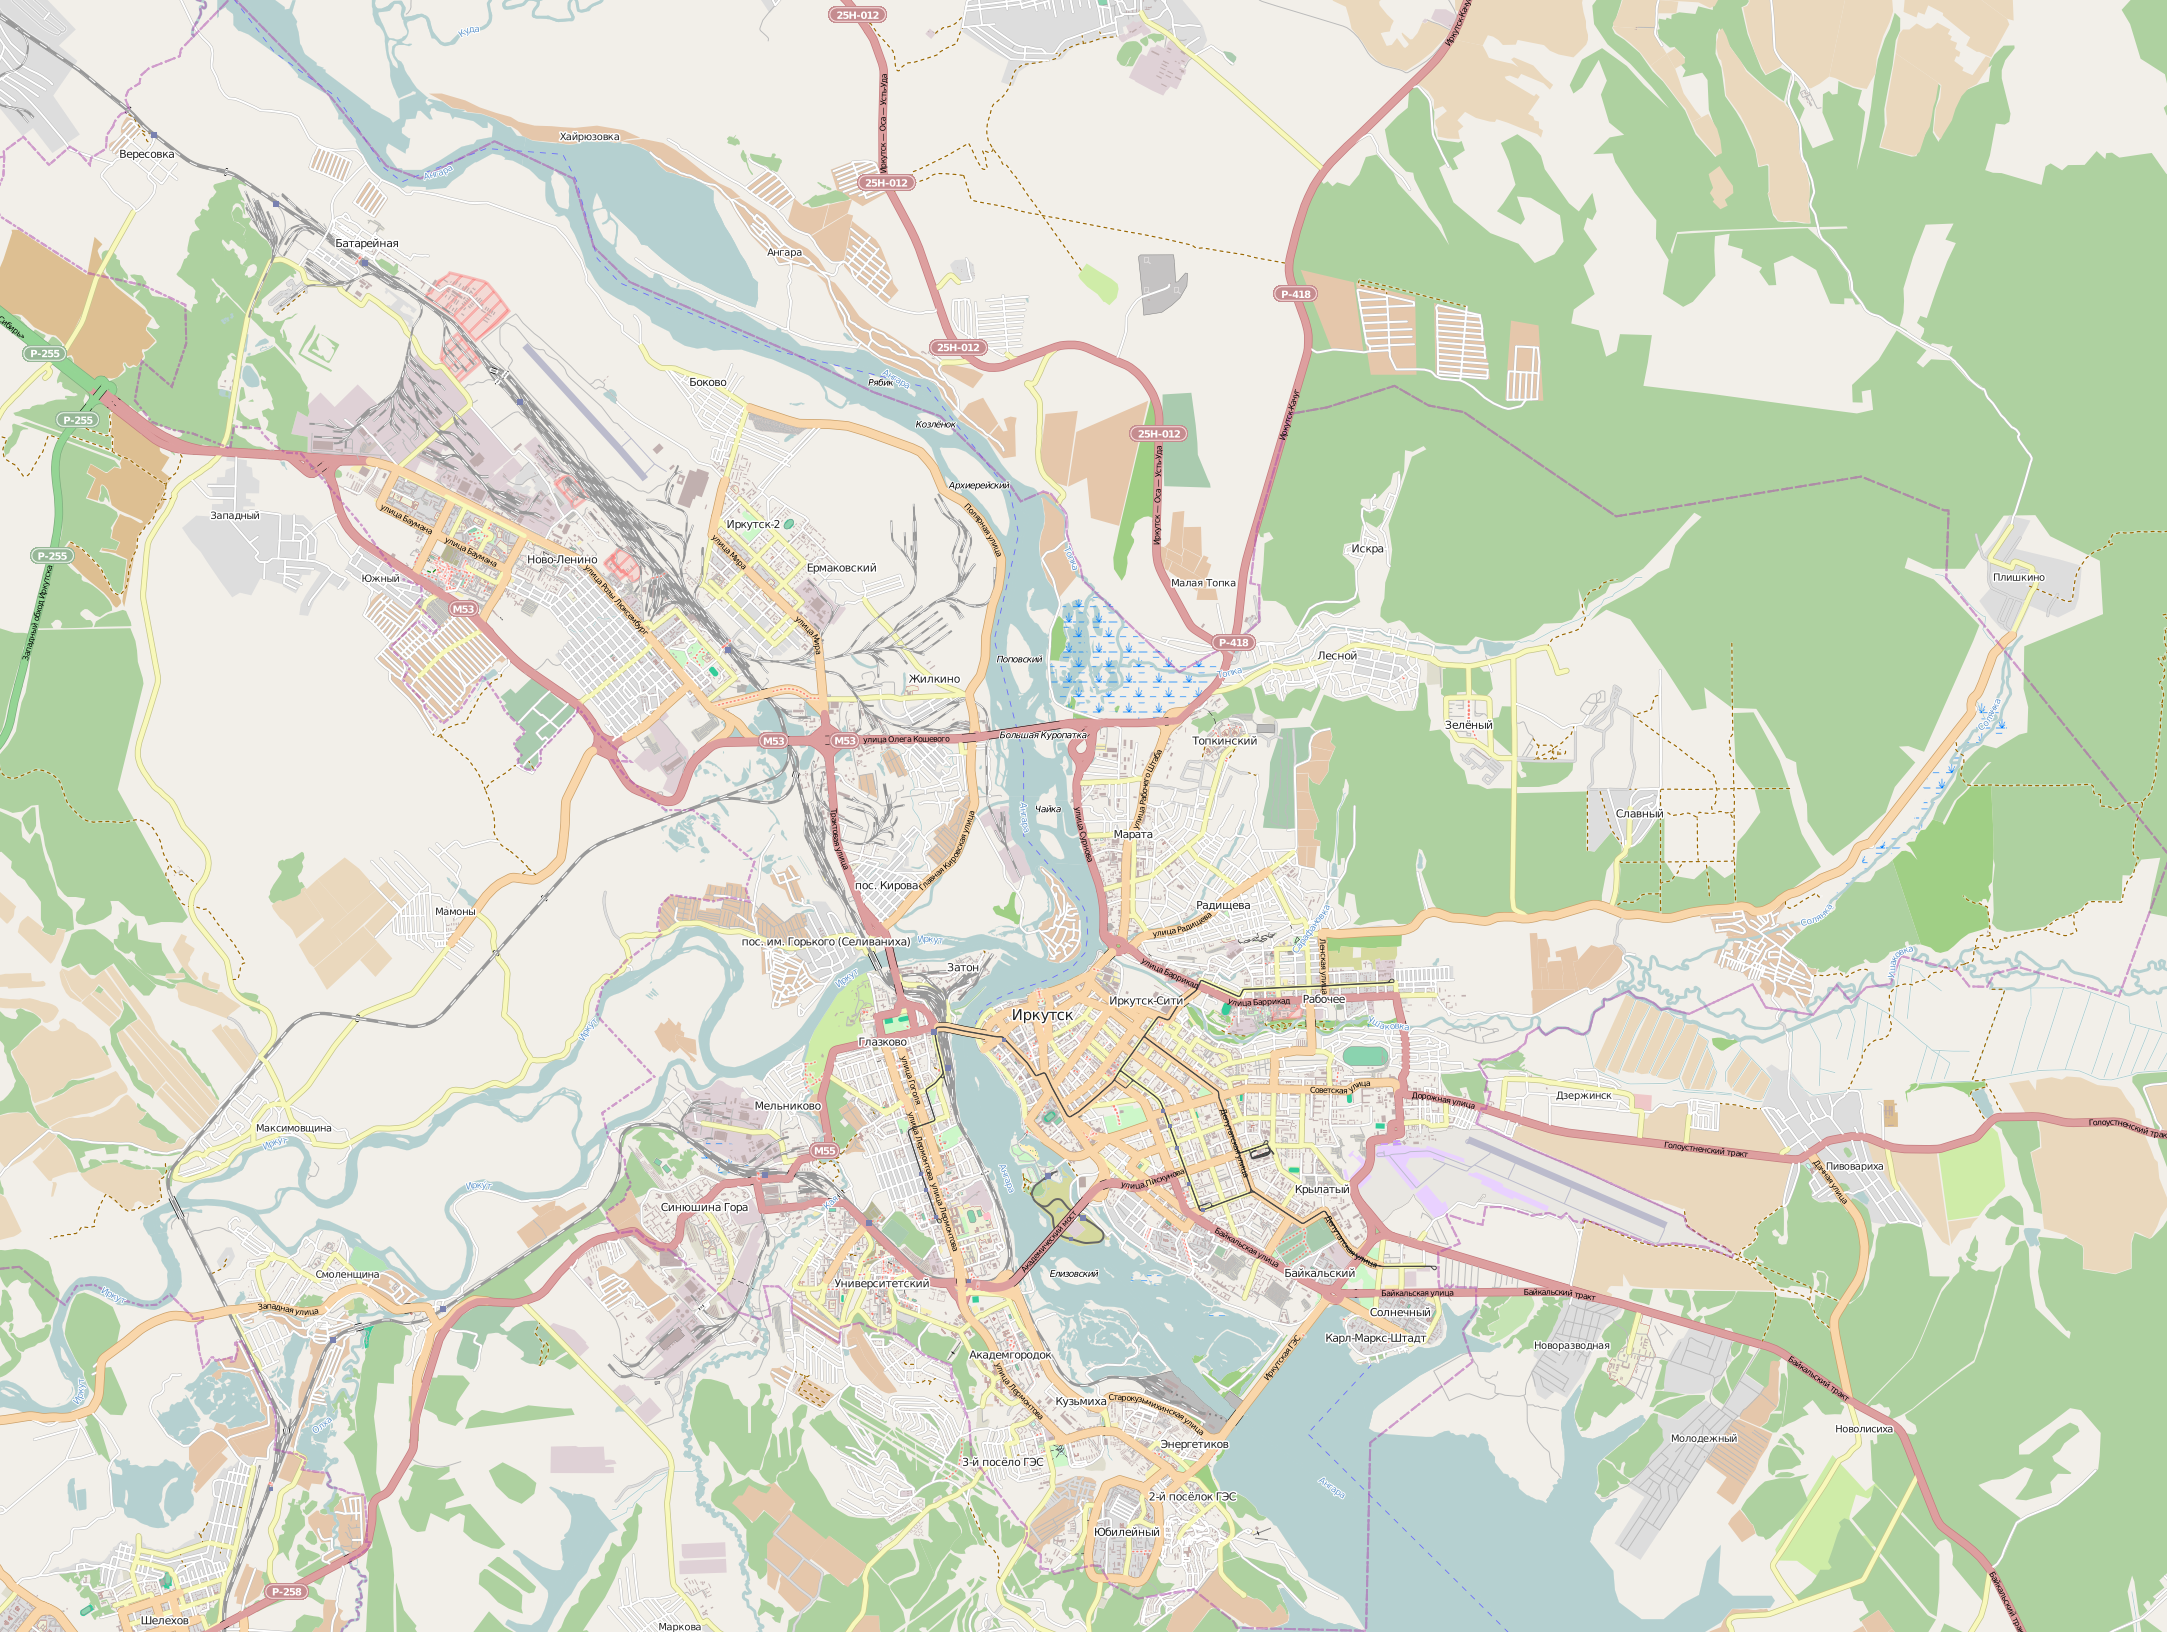 FileIrkutsk location mappng Wikimedia Commons